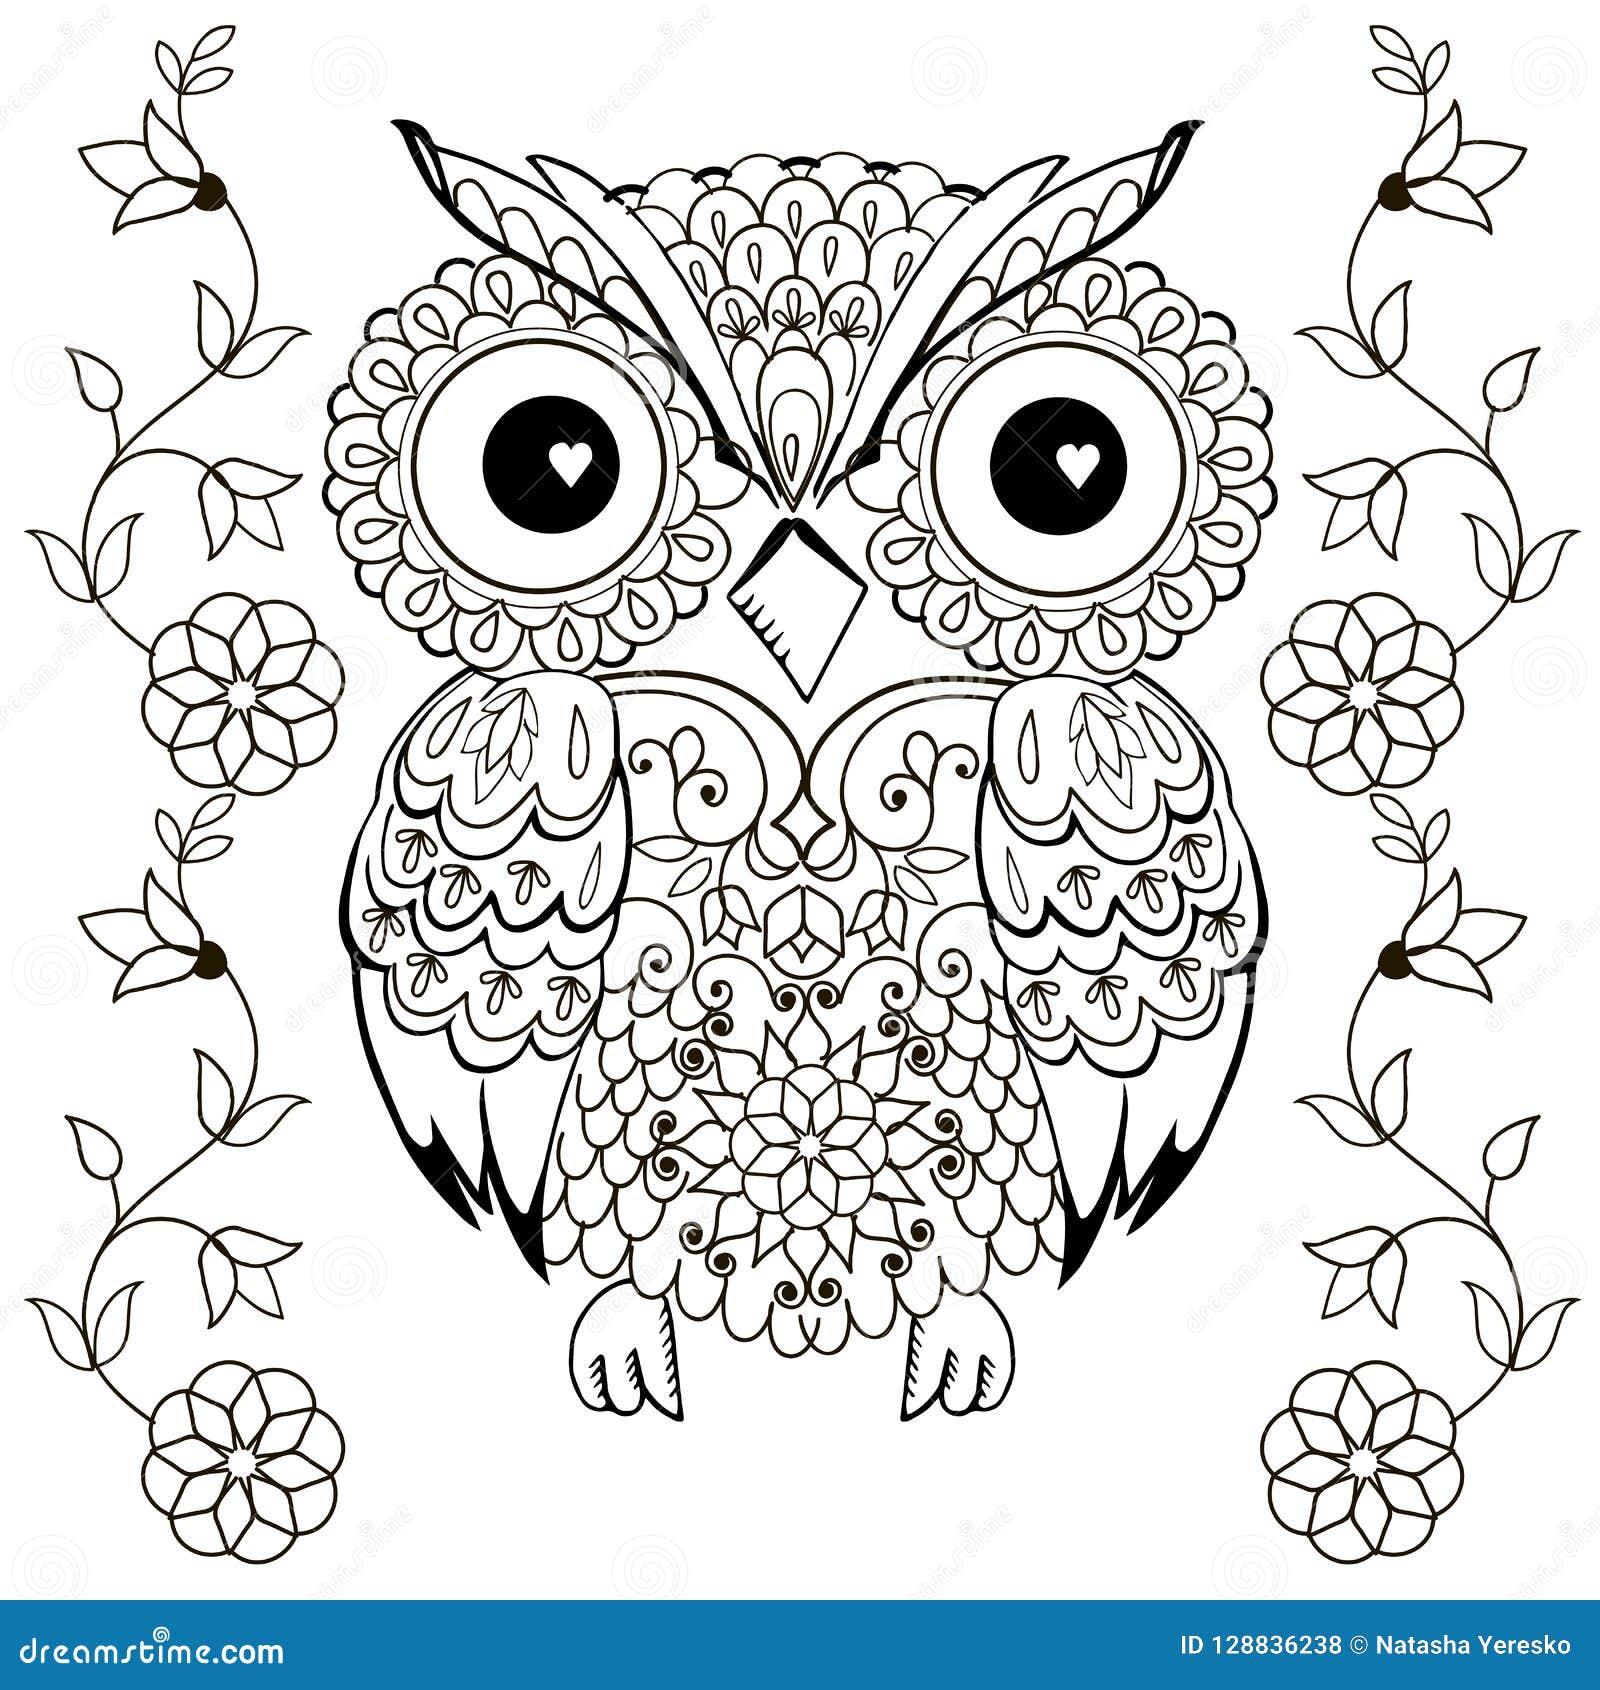 Desenho Da Coruja Para Colorir Antistress Ilustracao Do Vetor